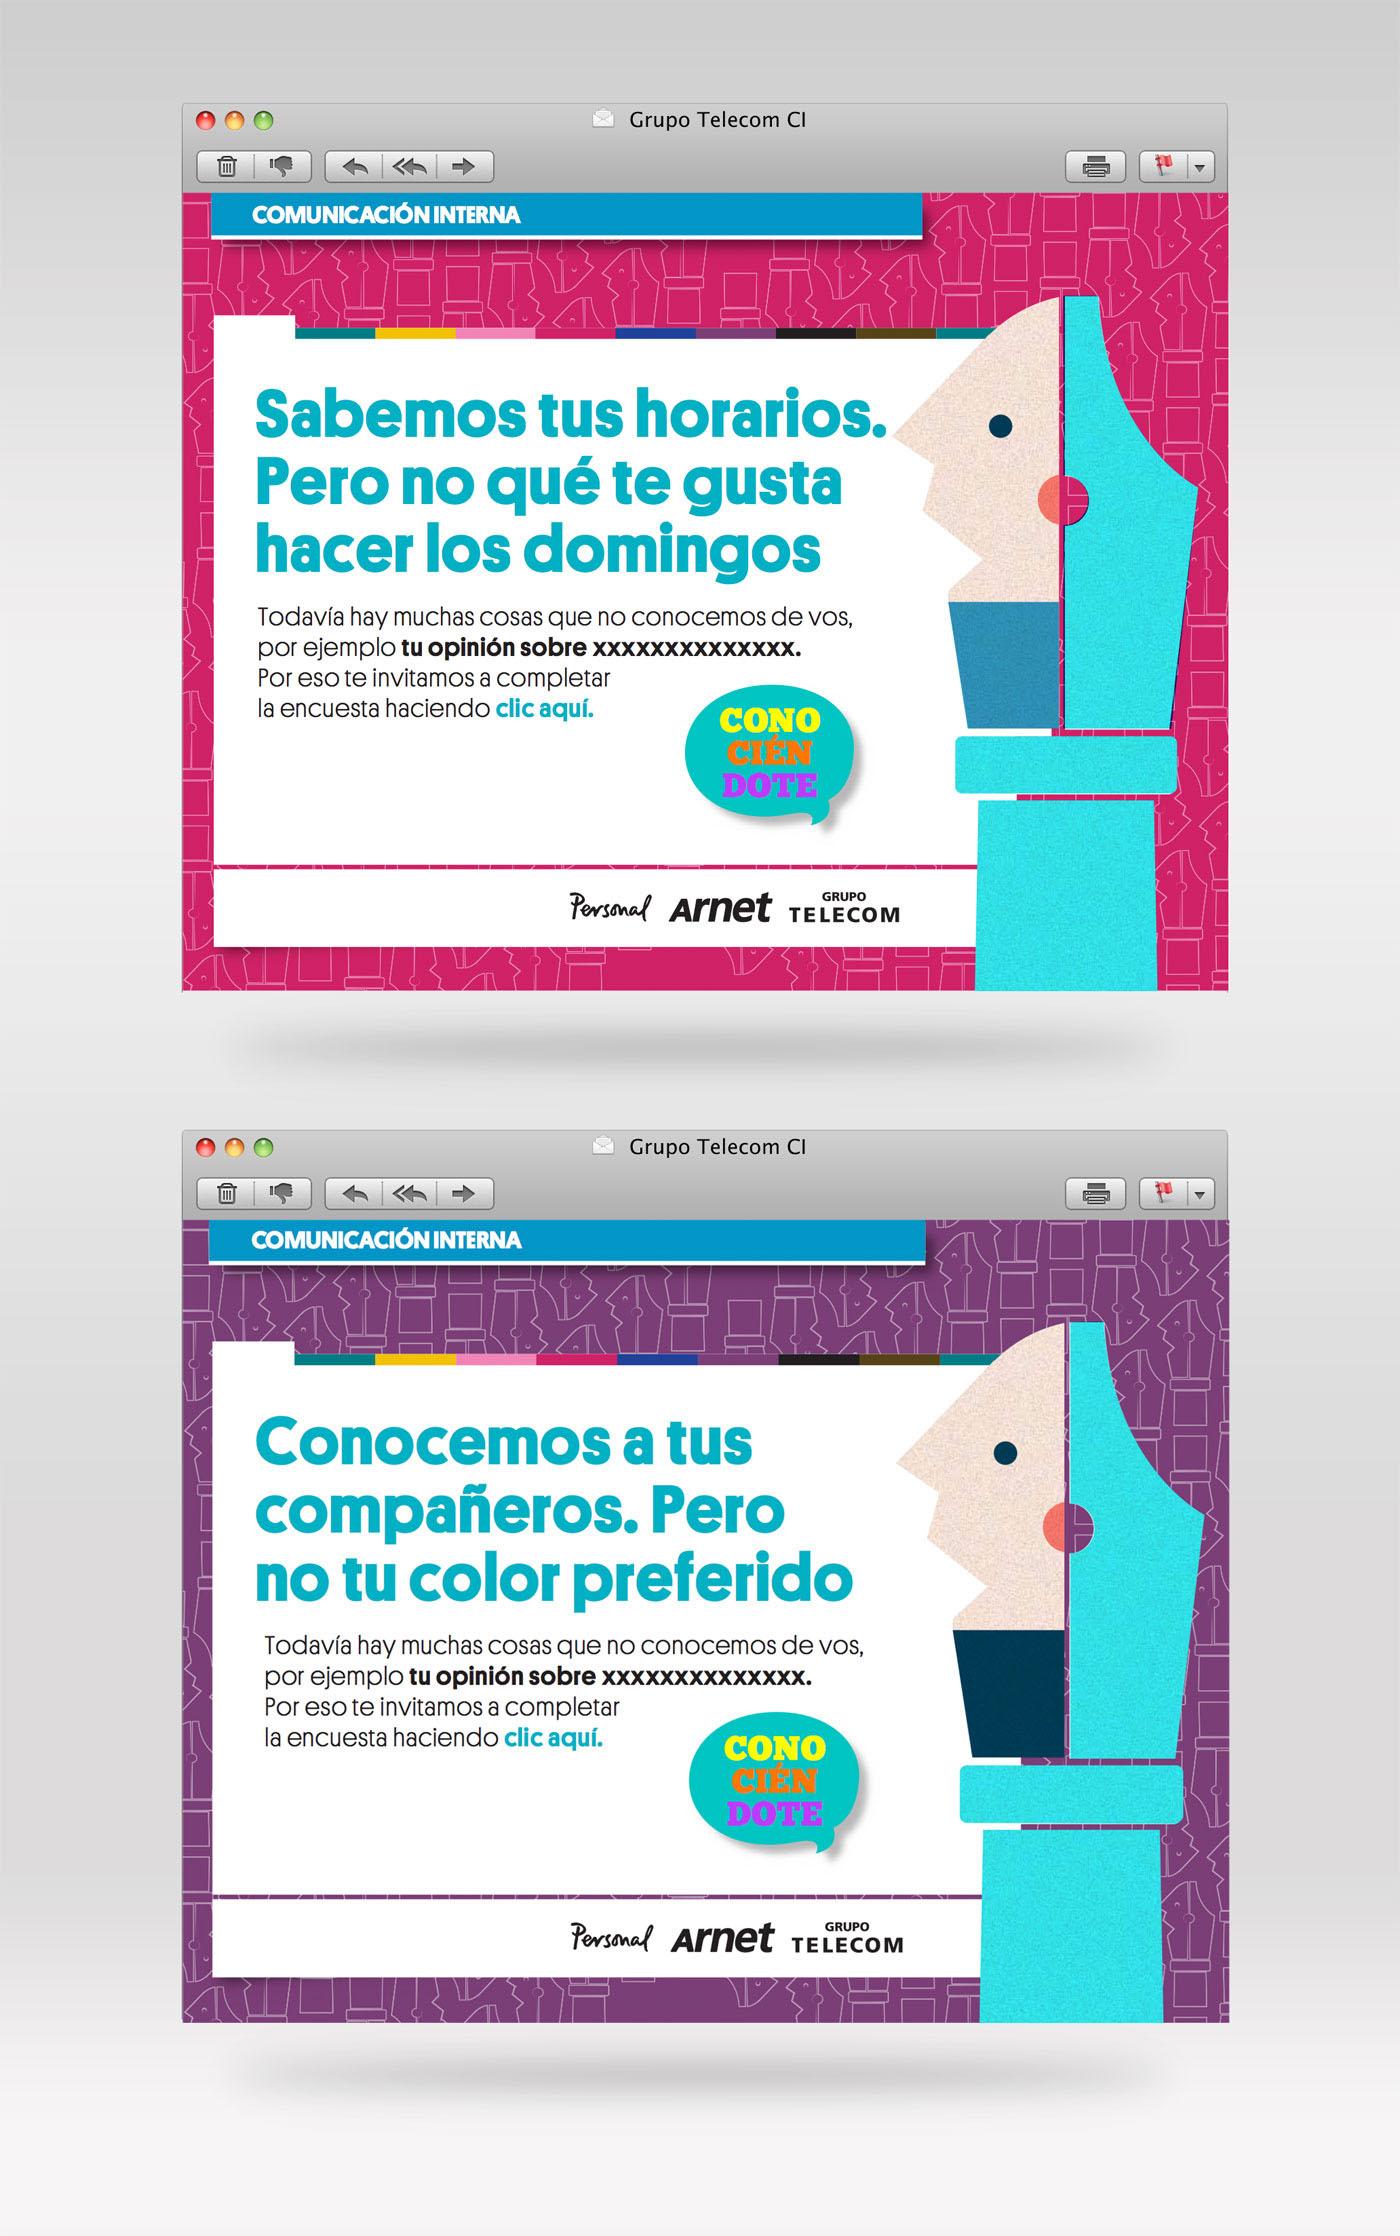 Web emailing Identidad Corporativa comunicacion interna editorial identity visual identity corporative Telecom tipography